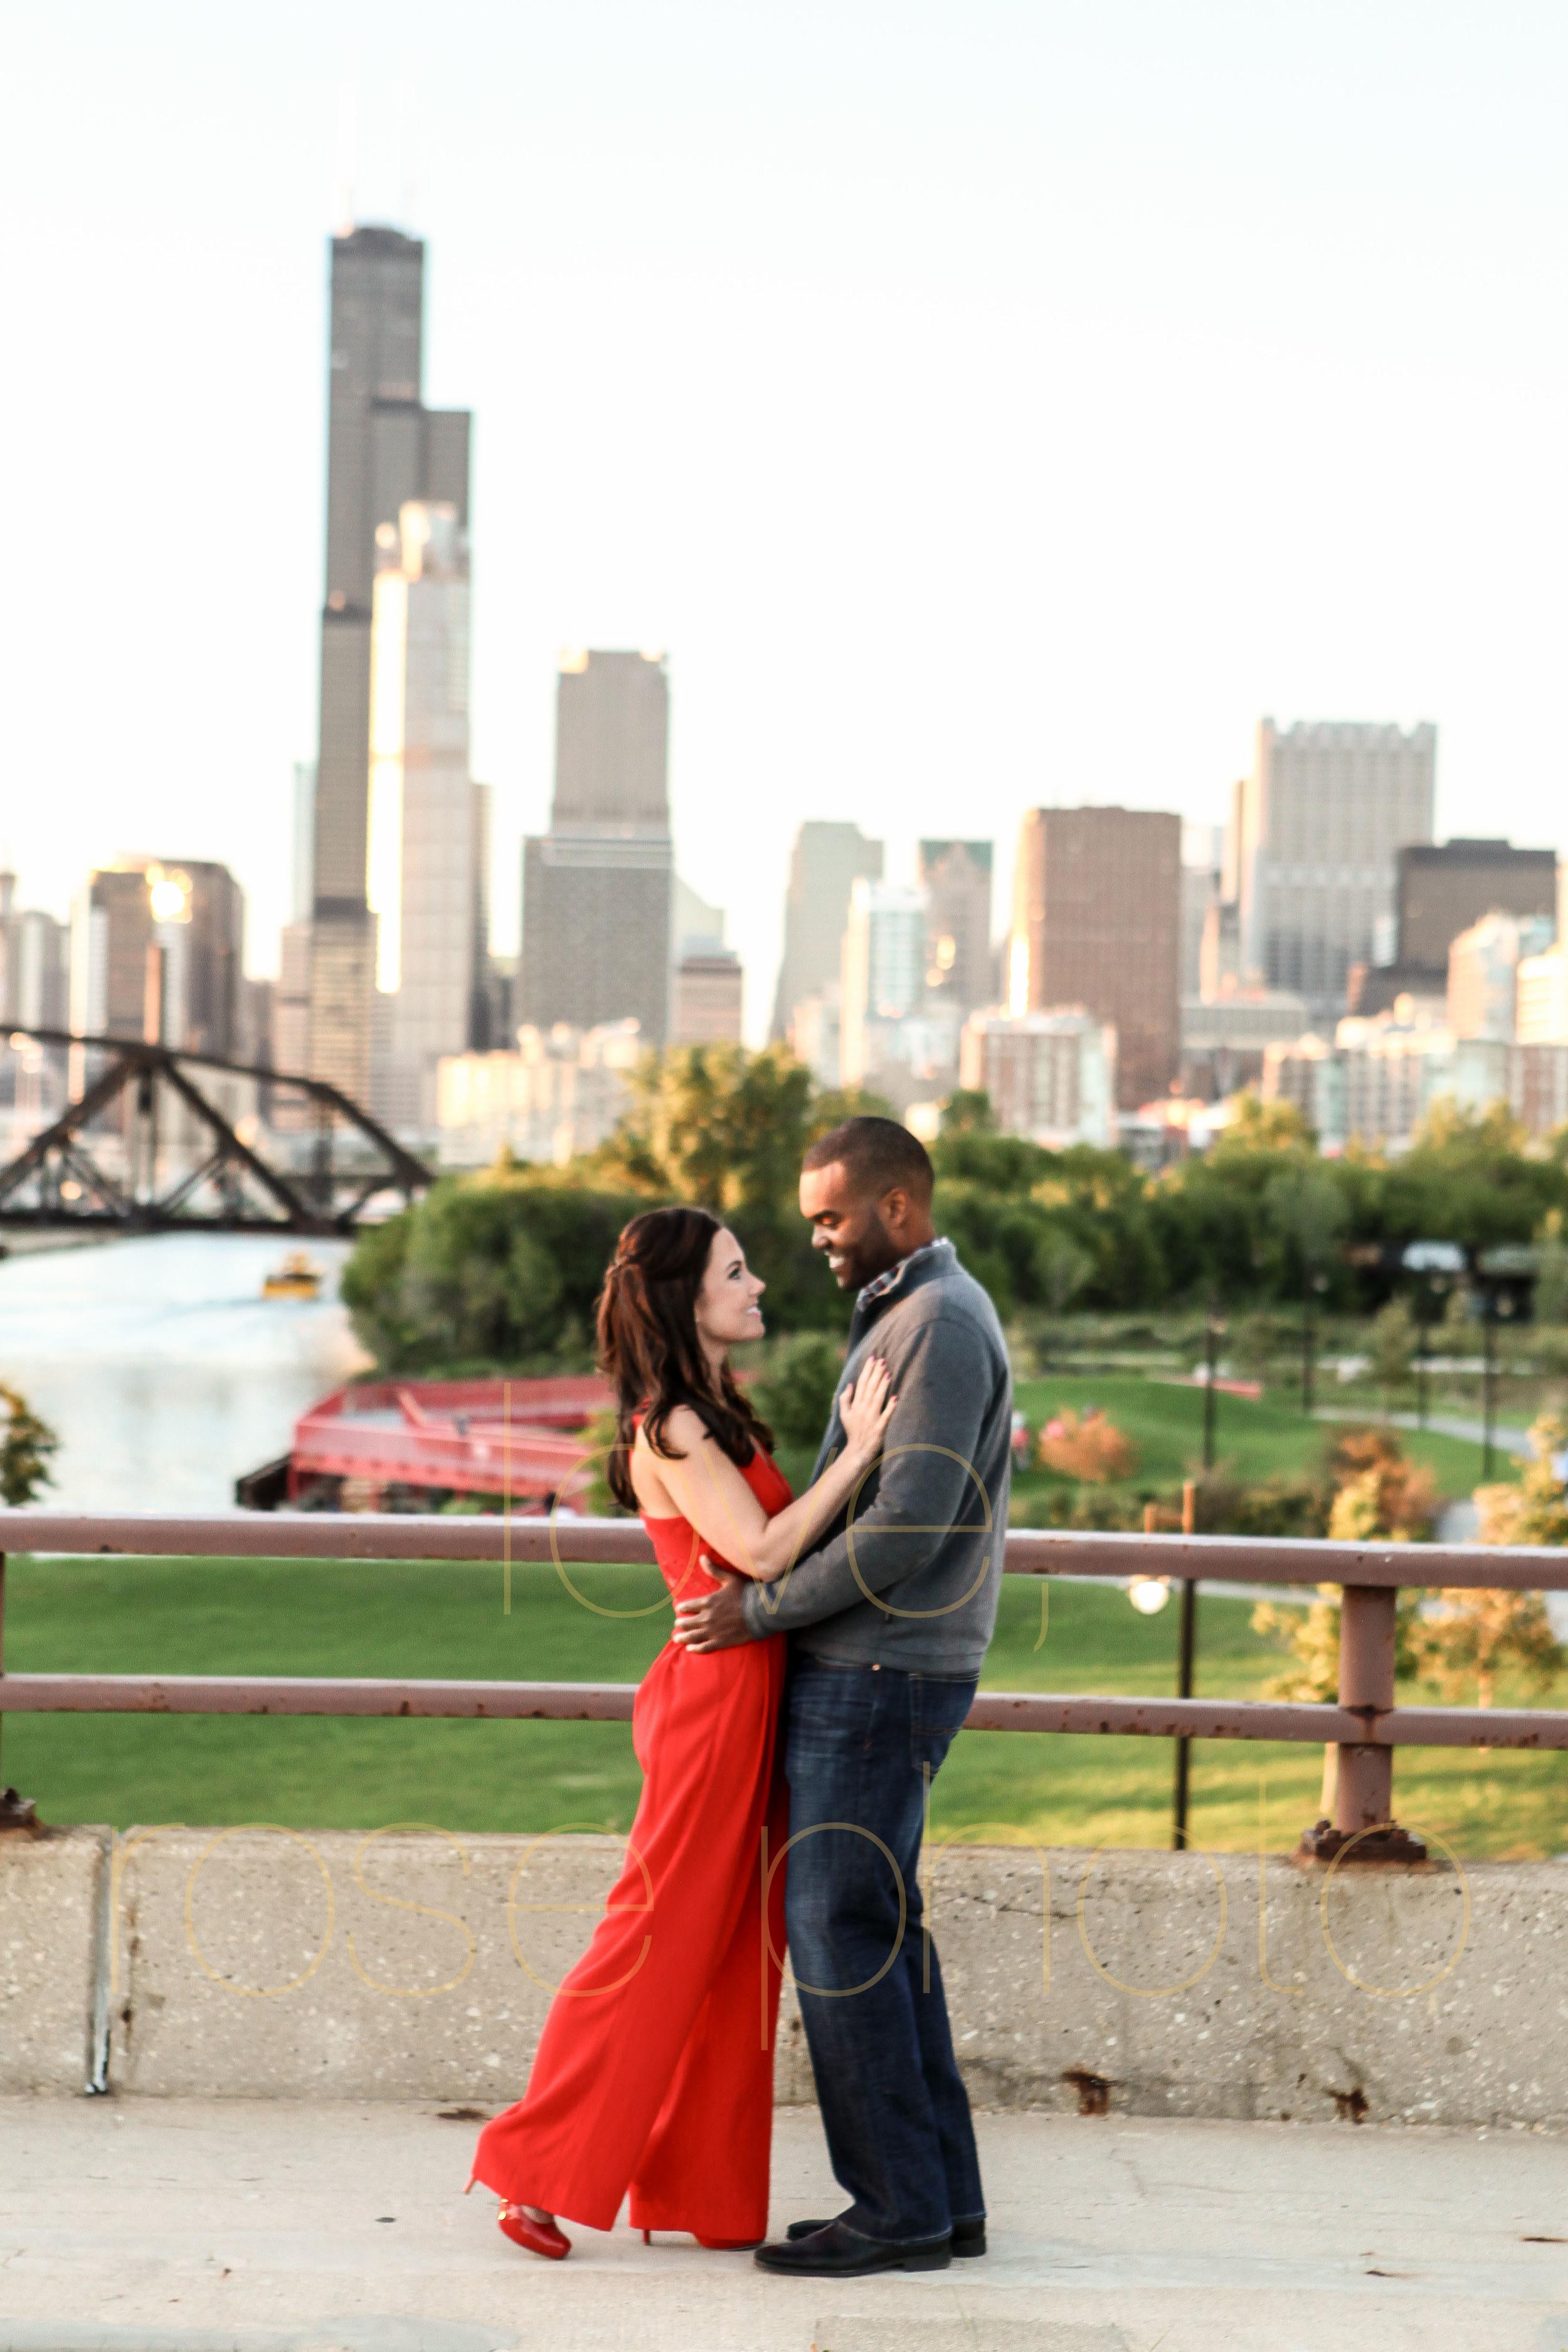 Sarah + Dimitri enagement shoot south loop 18th street bridge Chicago love has no boundries biracial couple loverosephoto -013.jpg